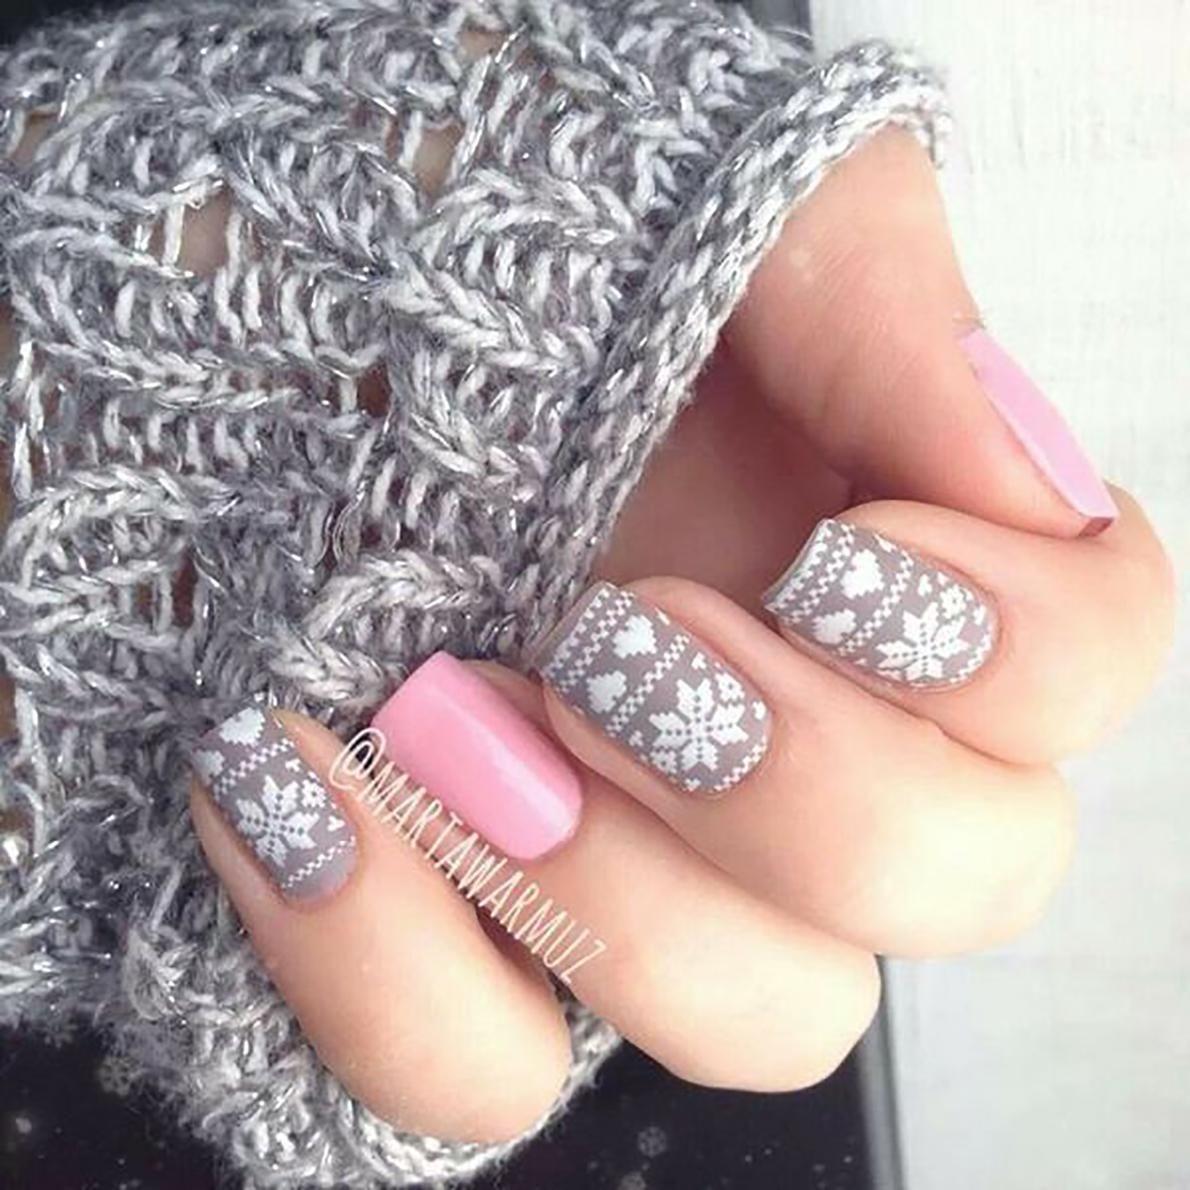 Nail Art  idées pour les fêtes  Pinterest  Make up Nail nail